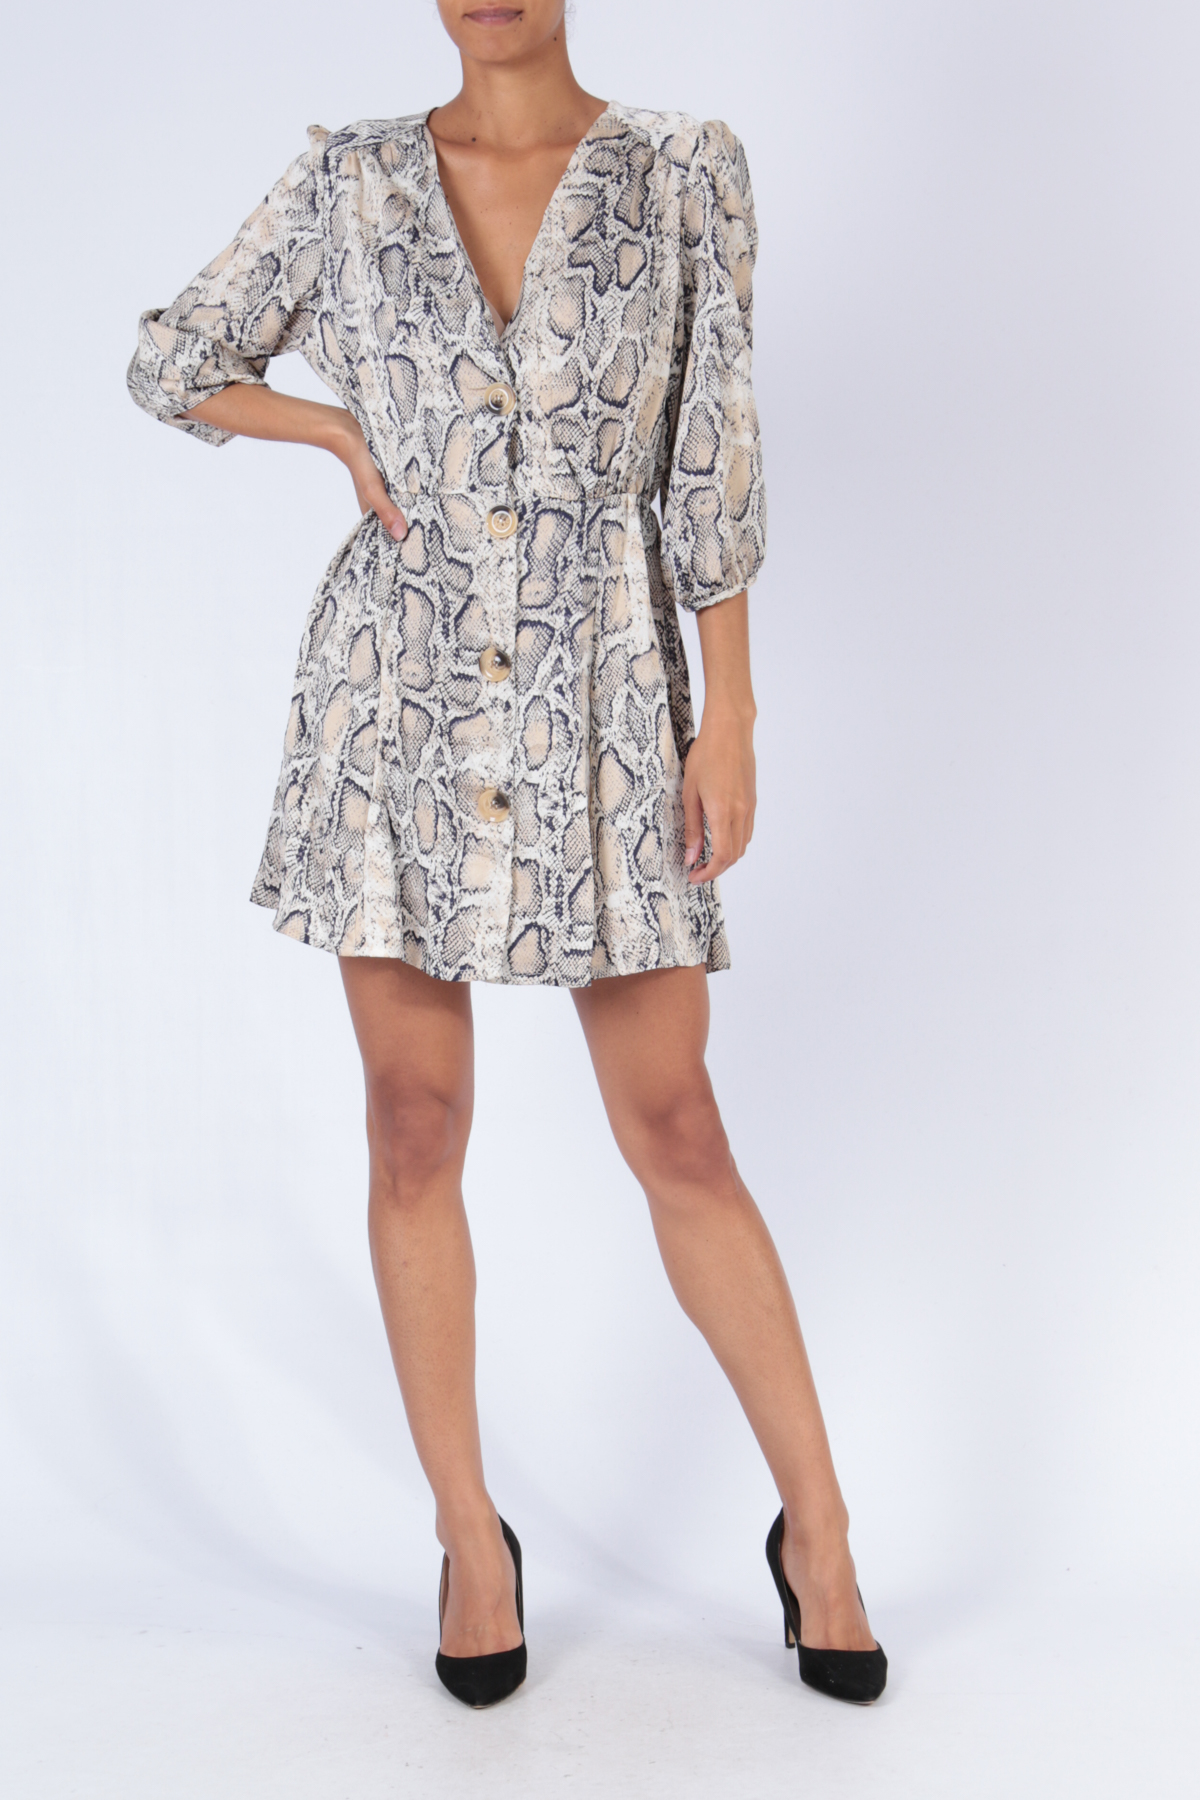 Robes courtes Femme D9000 Bigliuli